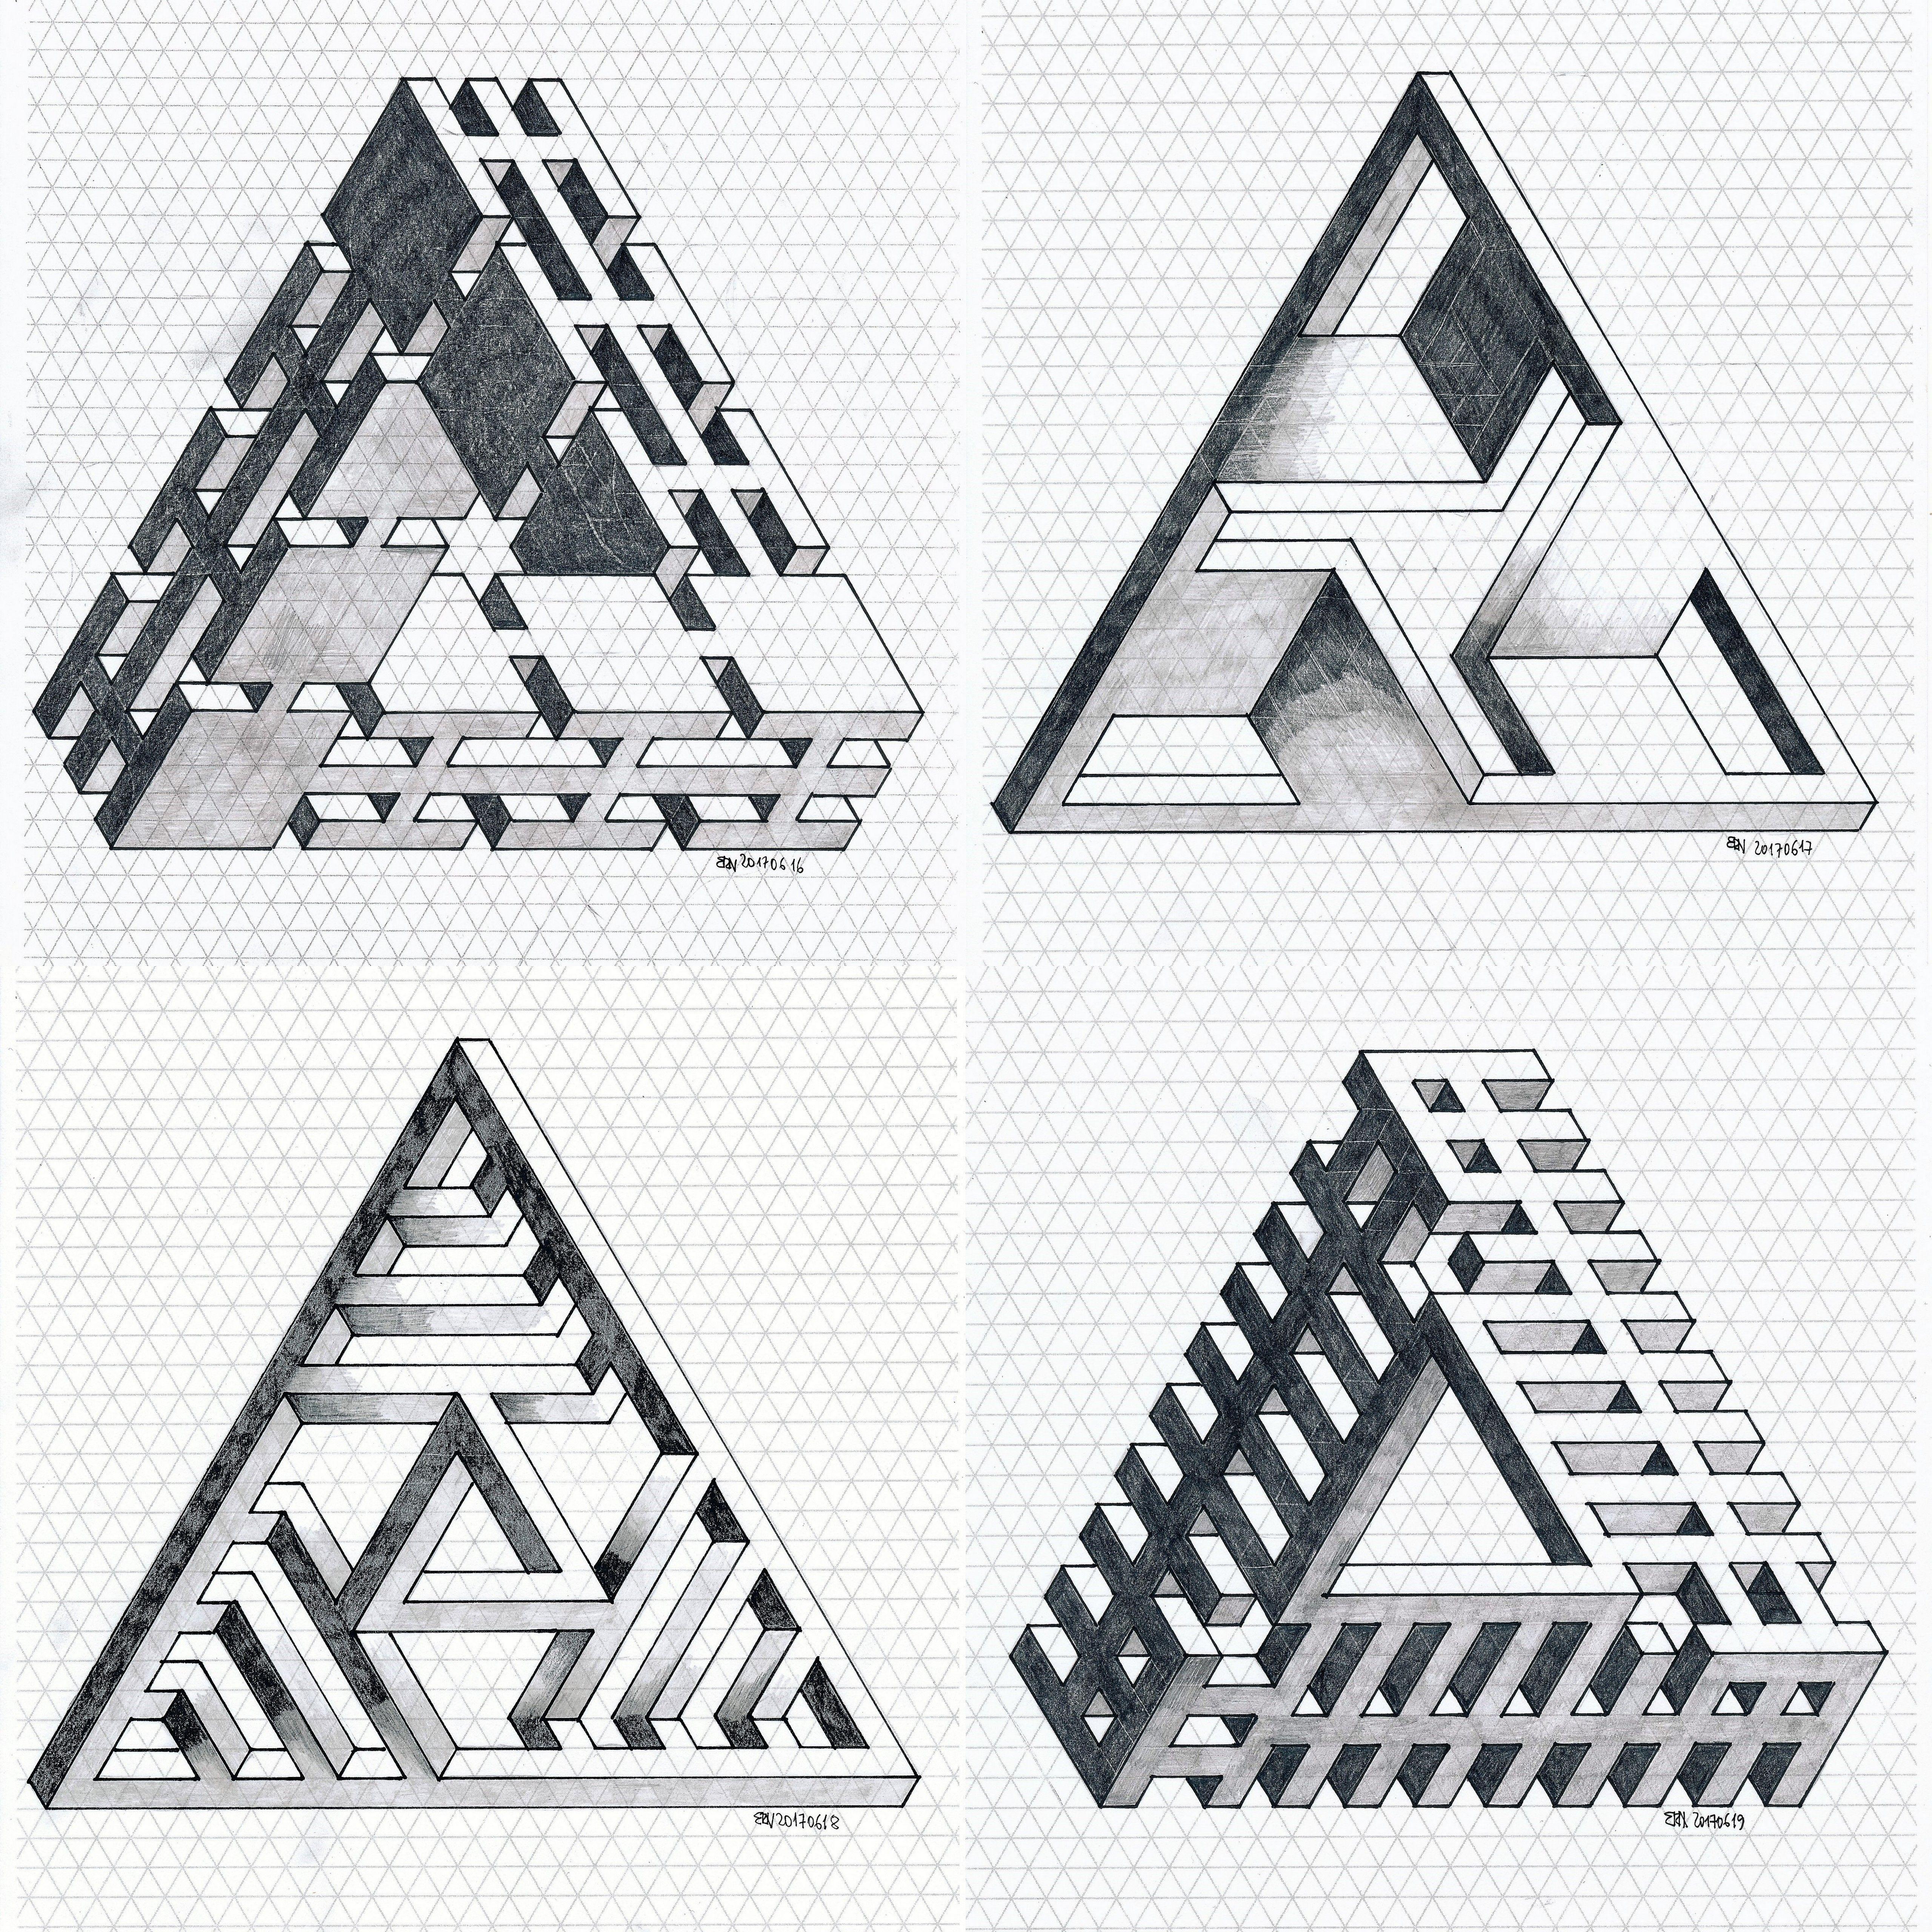 #isometric #impossible #penrosetriangle #mathart #regolo54